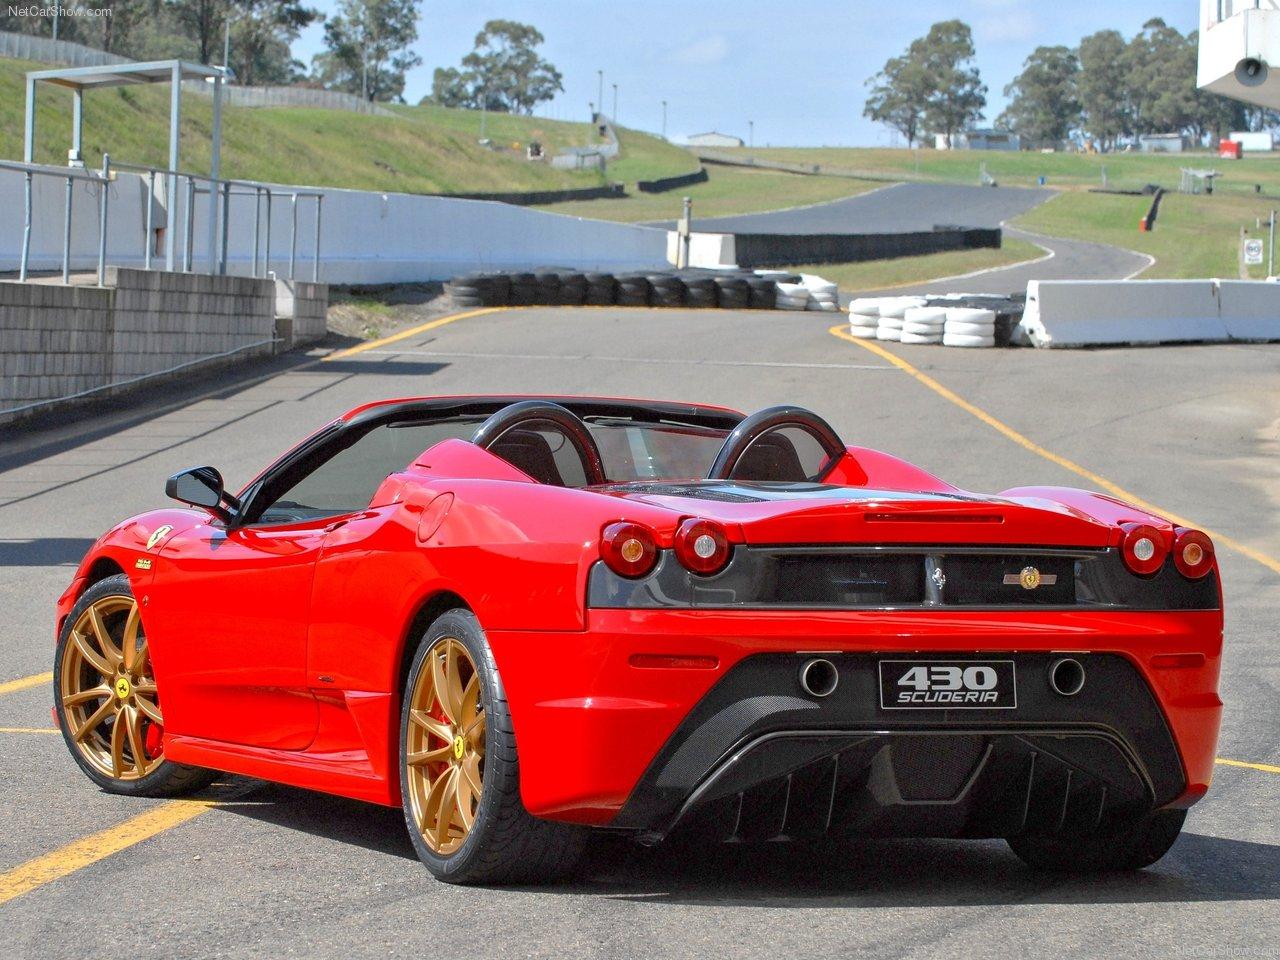 http://2.bp.blogspot.com/-yyOwPVzFZDQ/TYGLM8VLpYI/AAAAAAAABsY/yHx0kOzXeUY/s1600/Ferrari-Scuderia_Spider_16M_2009_1280x960_wallpaper_08.jpg